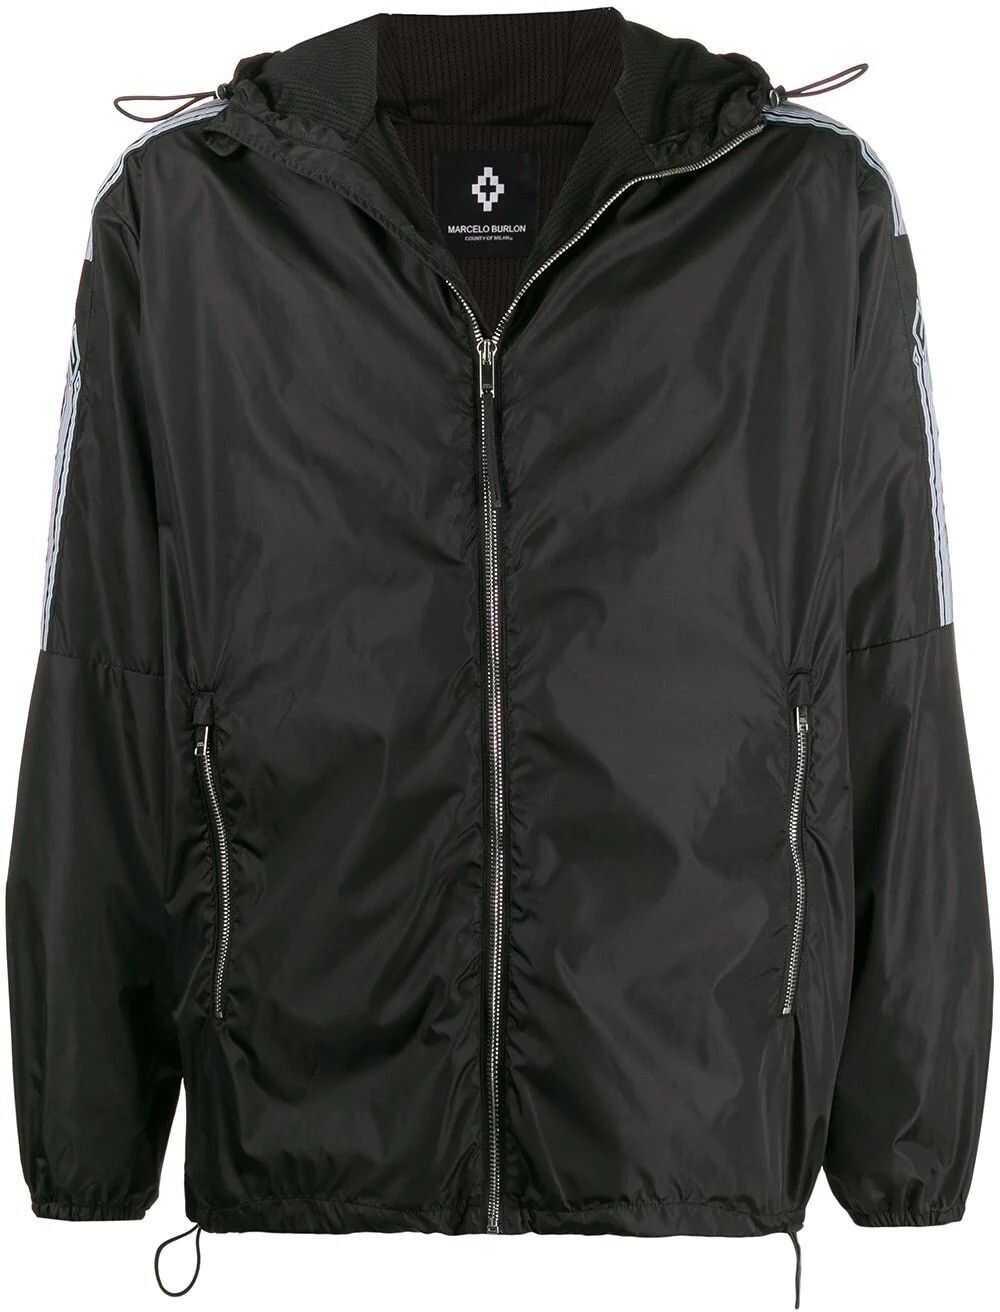 Marcelo Burlon Polyester Outerwear Jacket BLACK